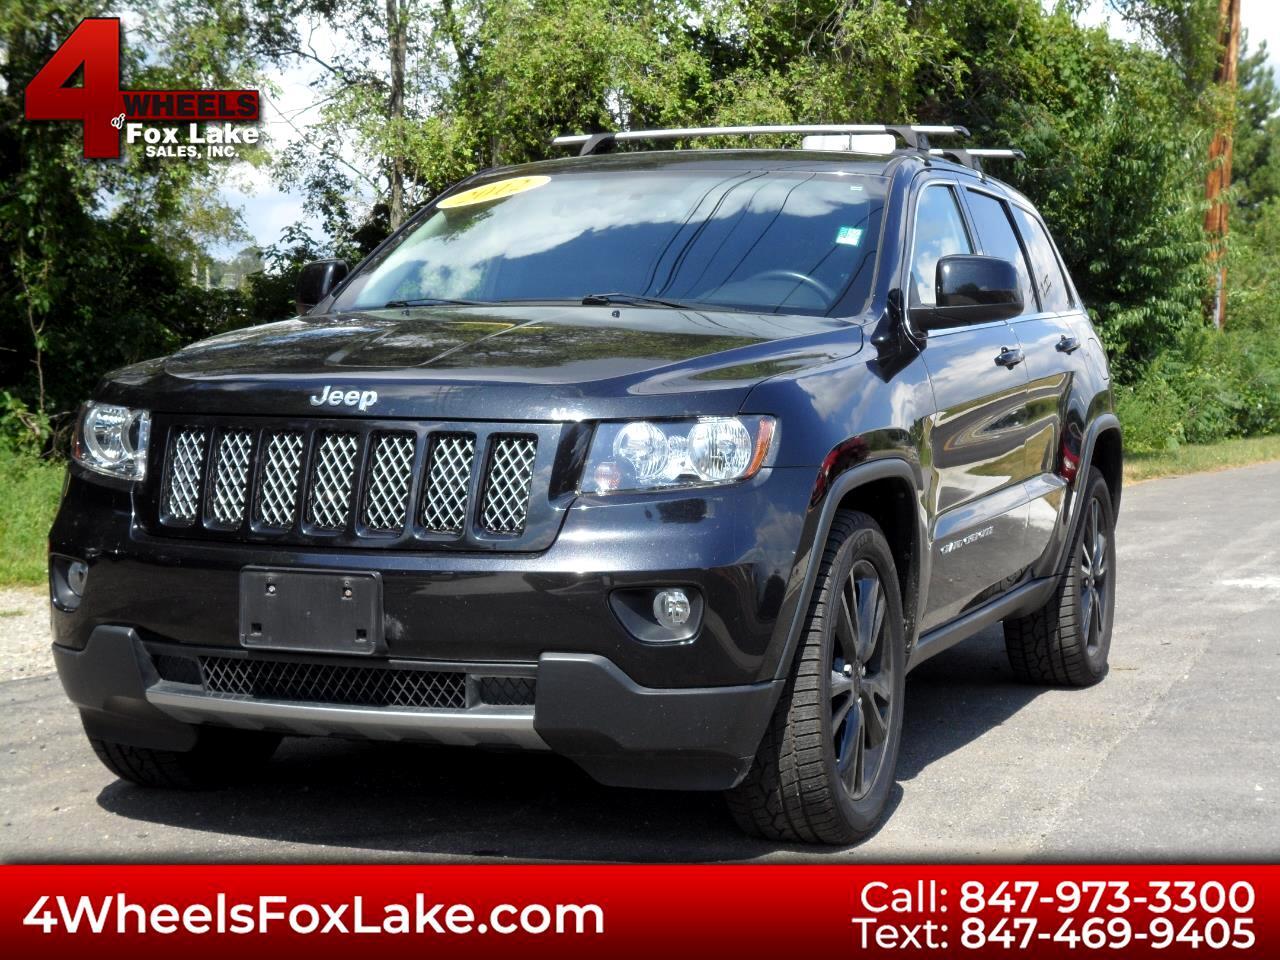 2012 Jeep Grand Cherokee High Altitude 4x4